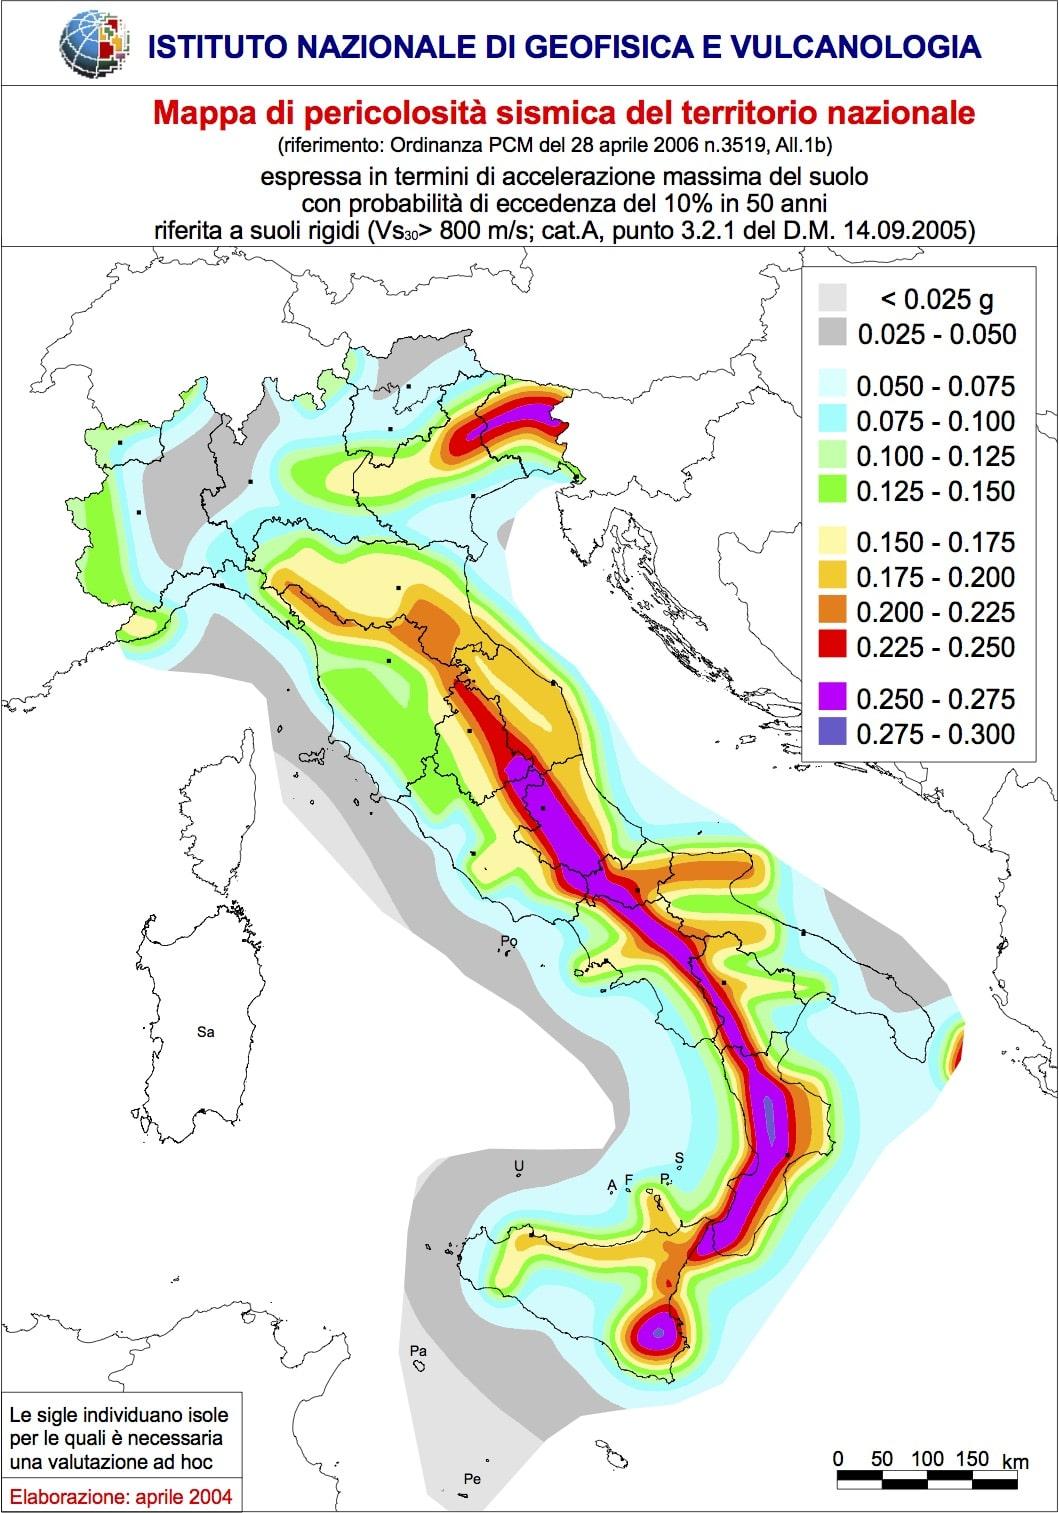 Cartina Italia Terremoti.Terremoto Oggi Ingv Lista Terremoti Ultima Ora In Tempo Reale Ultime News